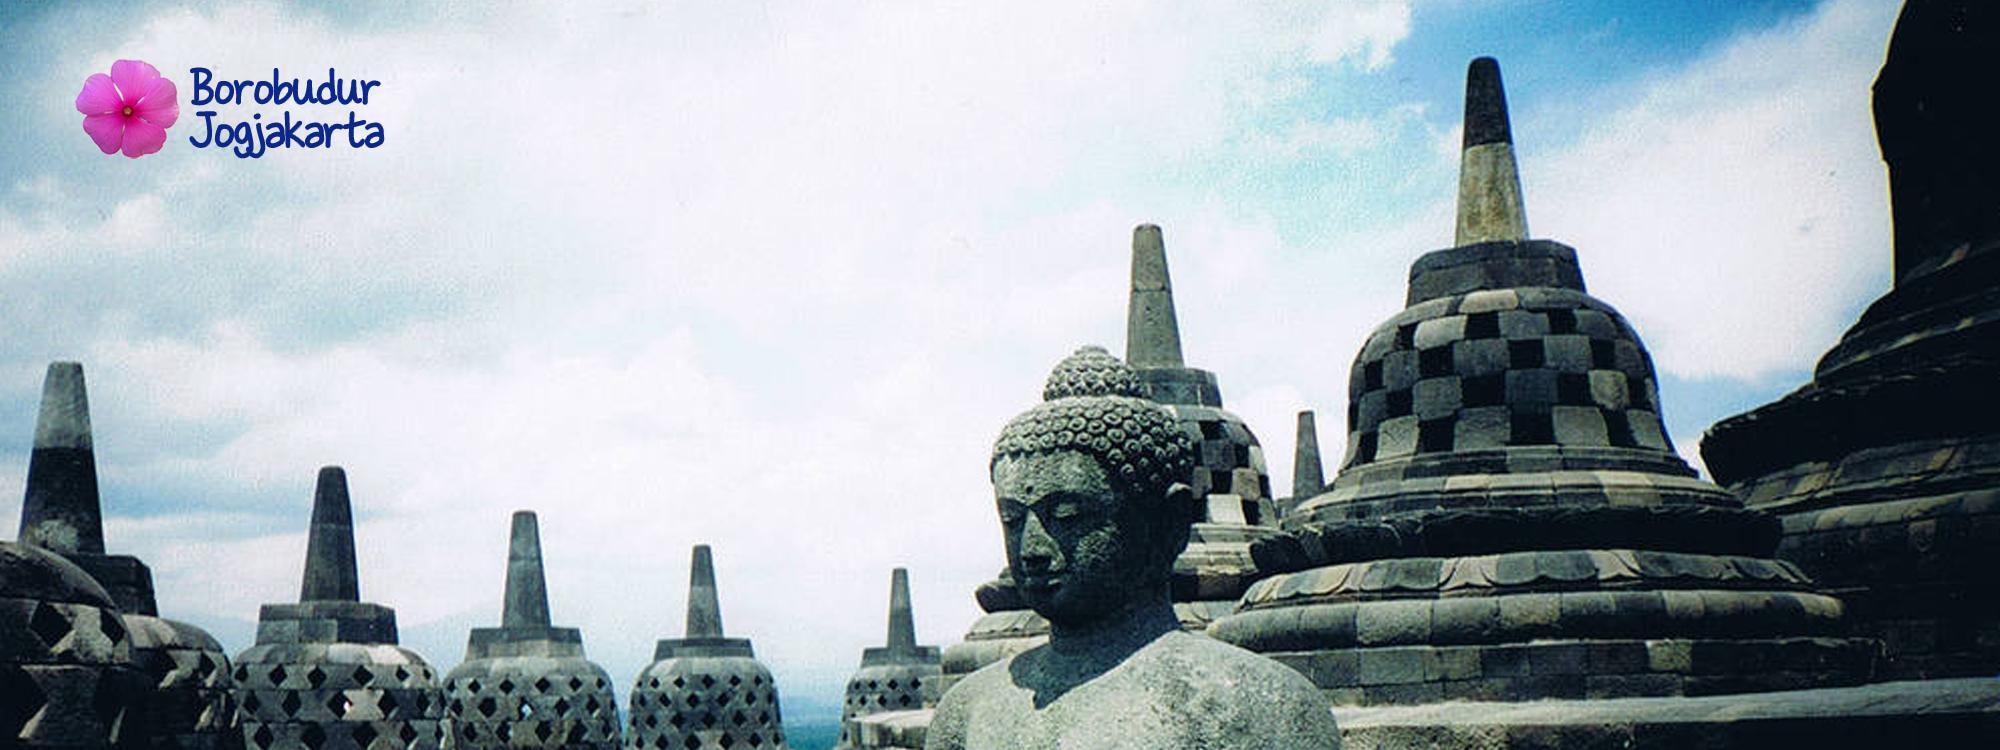 10992758844 cdf38999eb o Borobudur Temple   Jogjakarta